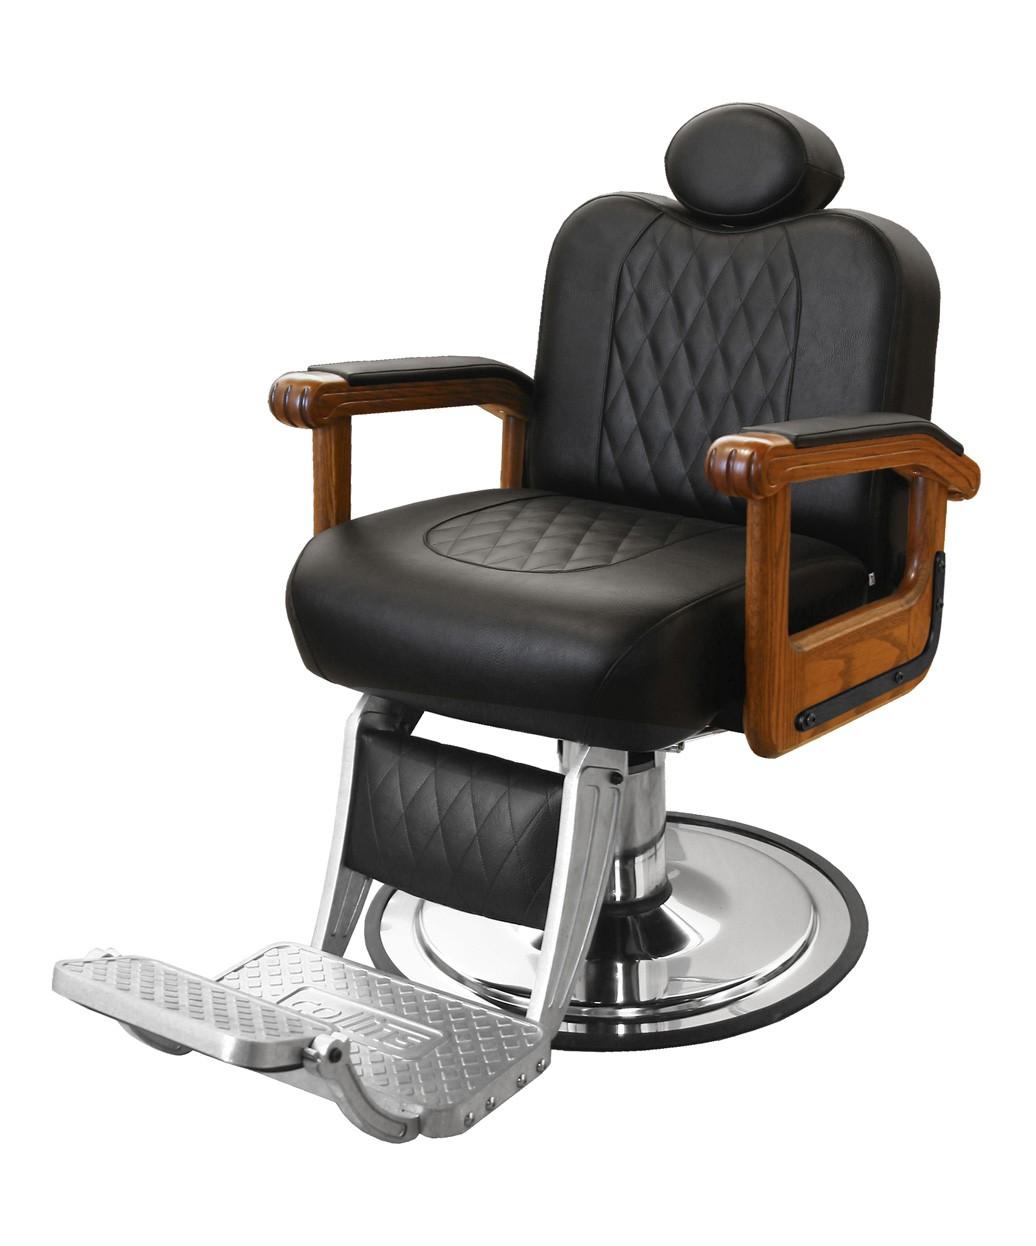 spa pedicure chairs canada pow mia chair cavalier barber salon furniture toronto usf